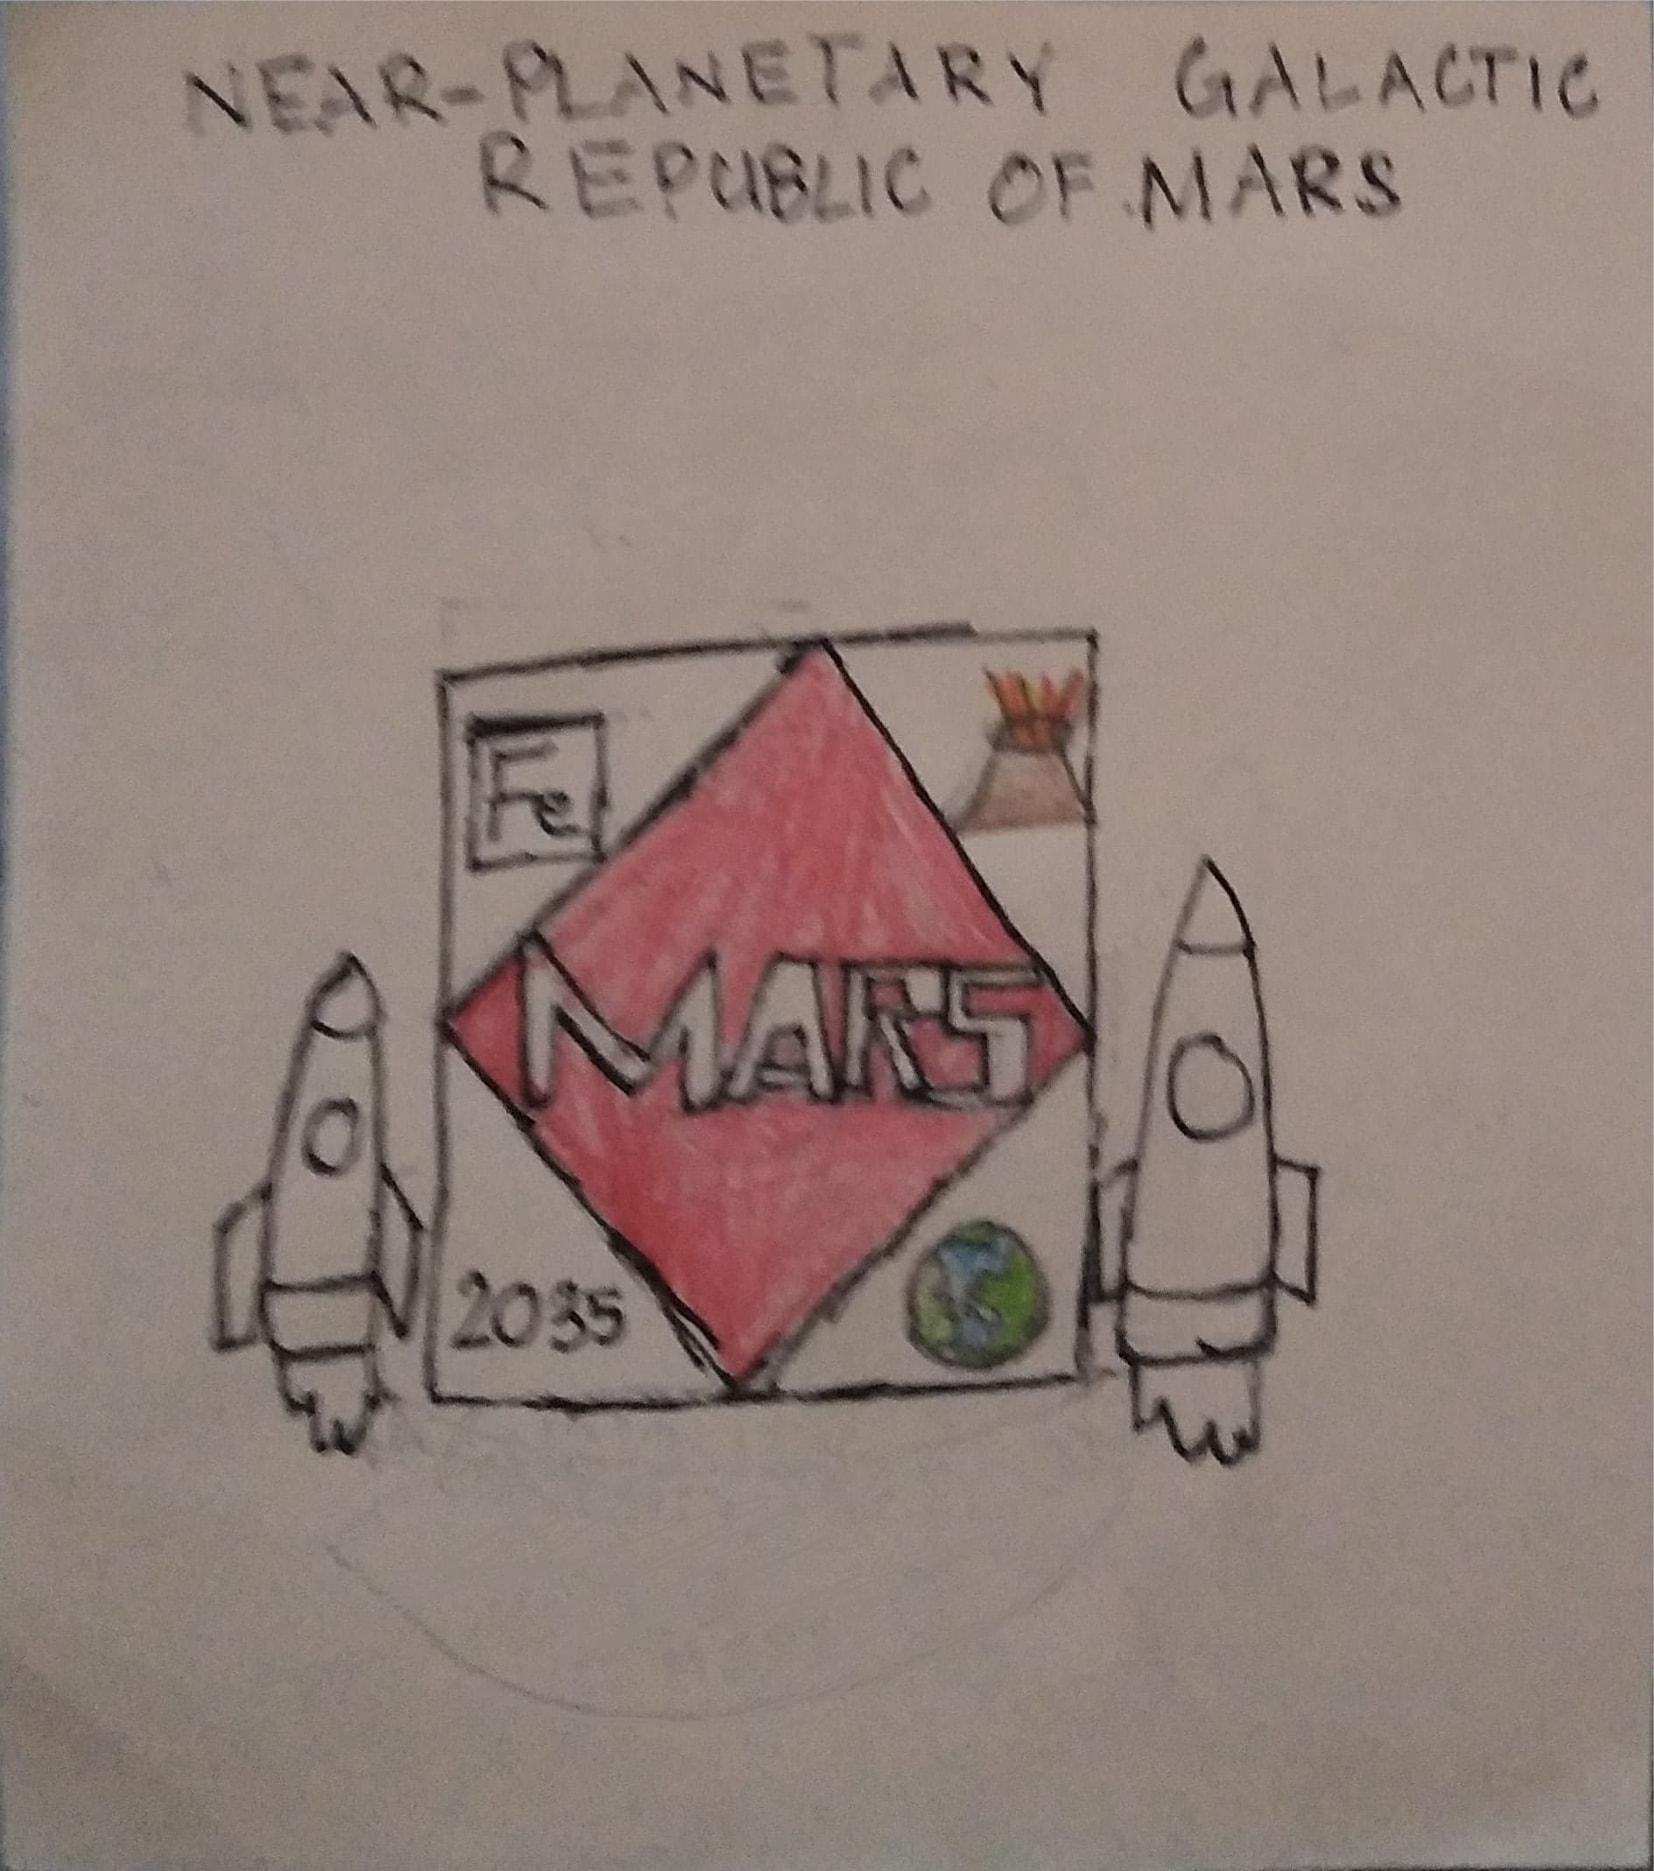 Mars Passport Cover_1 - RJ VW